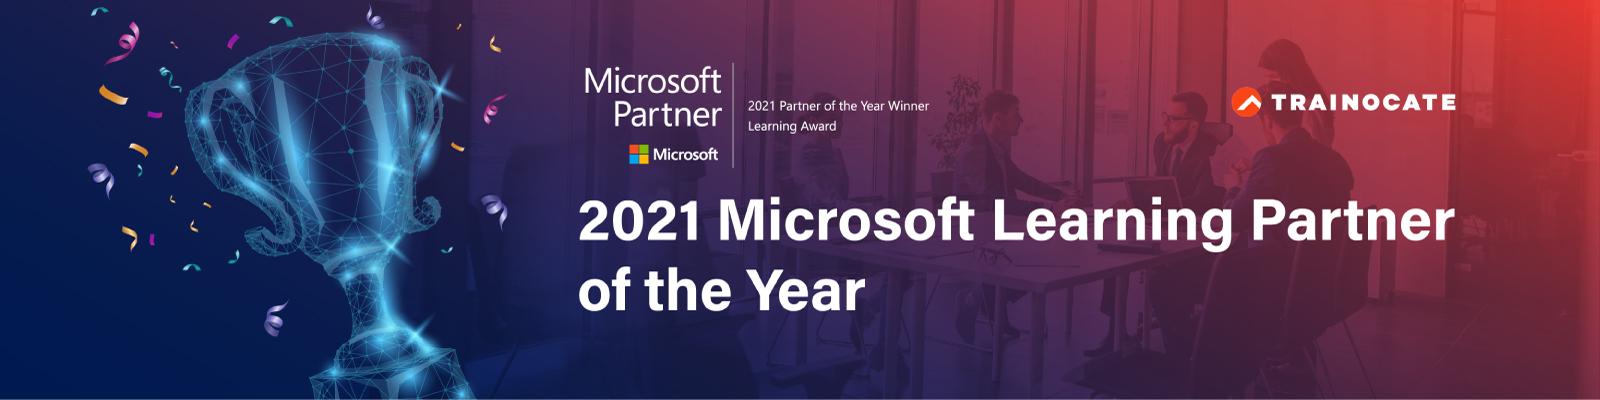 trainocate-microsoft-learning-partner-award-2021-02